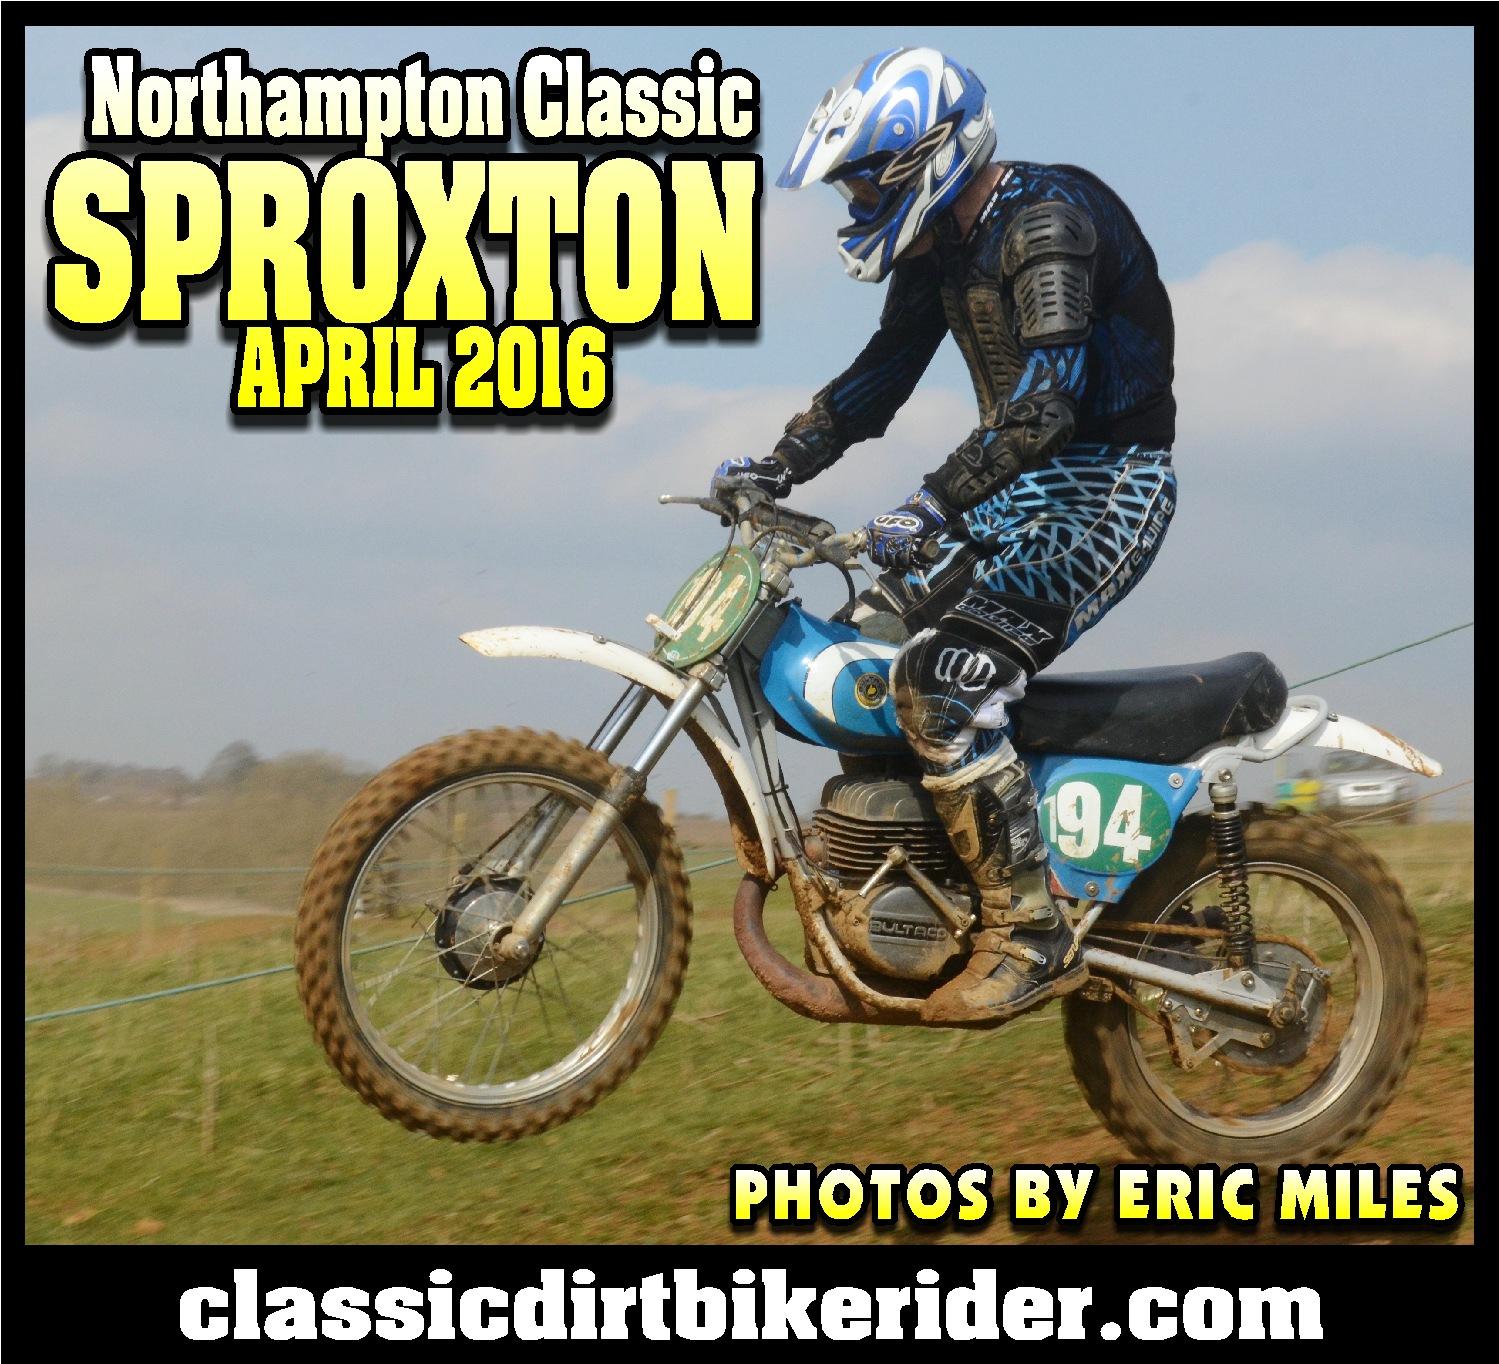 Northampton Classic Scramble Sproxton April 2016 www.classicdirtbikerider.com Photos by Eric Miles (1)